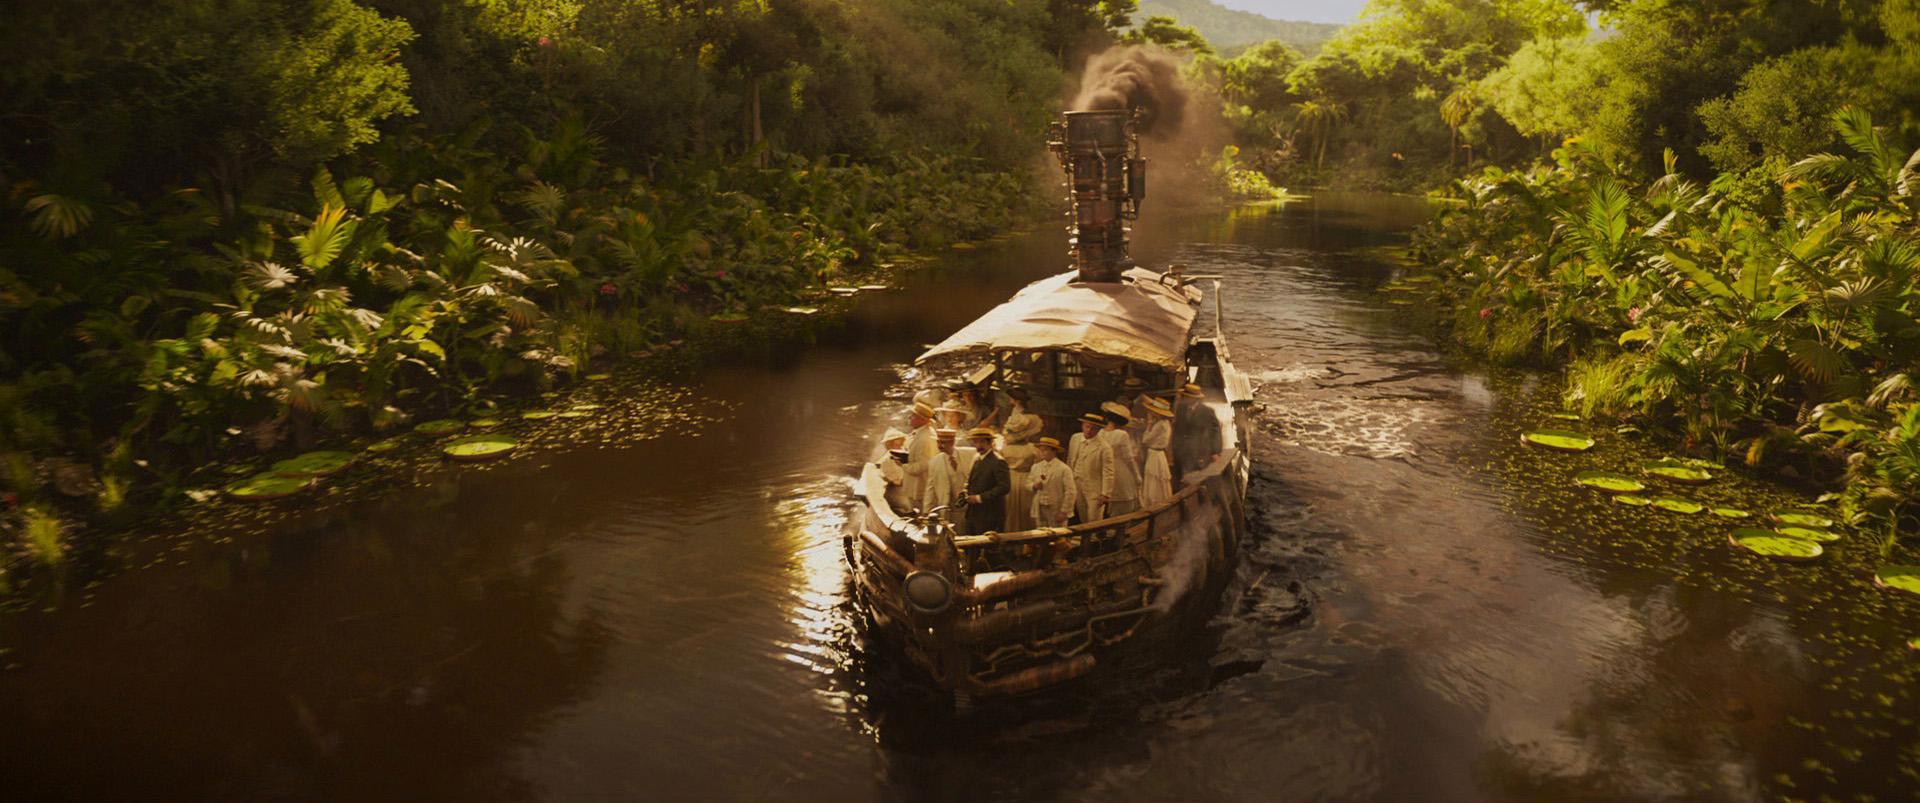 Orman Gezisi   Jungle Cruise   2021   WEB-DL   XviD   Türkçe Altyazılı   m720p - m1080p   WEB-DL   Tek Link